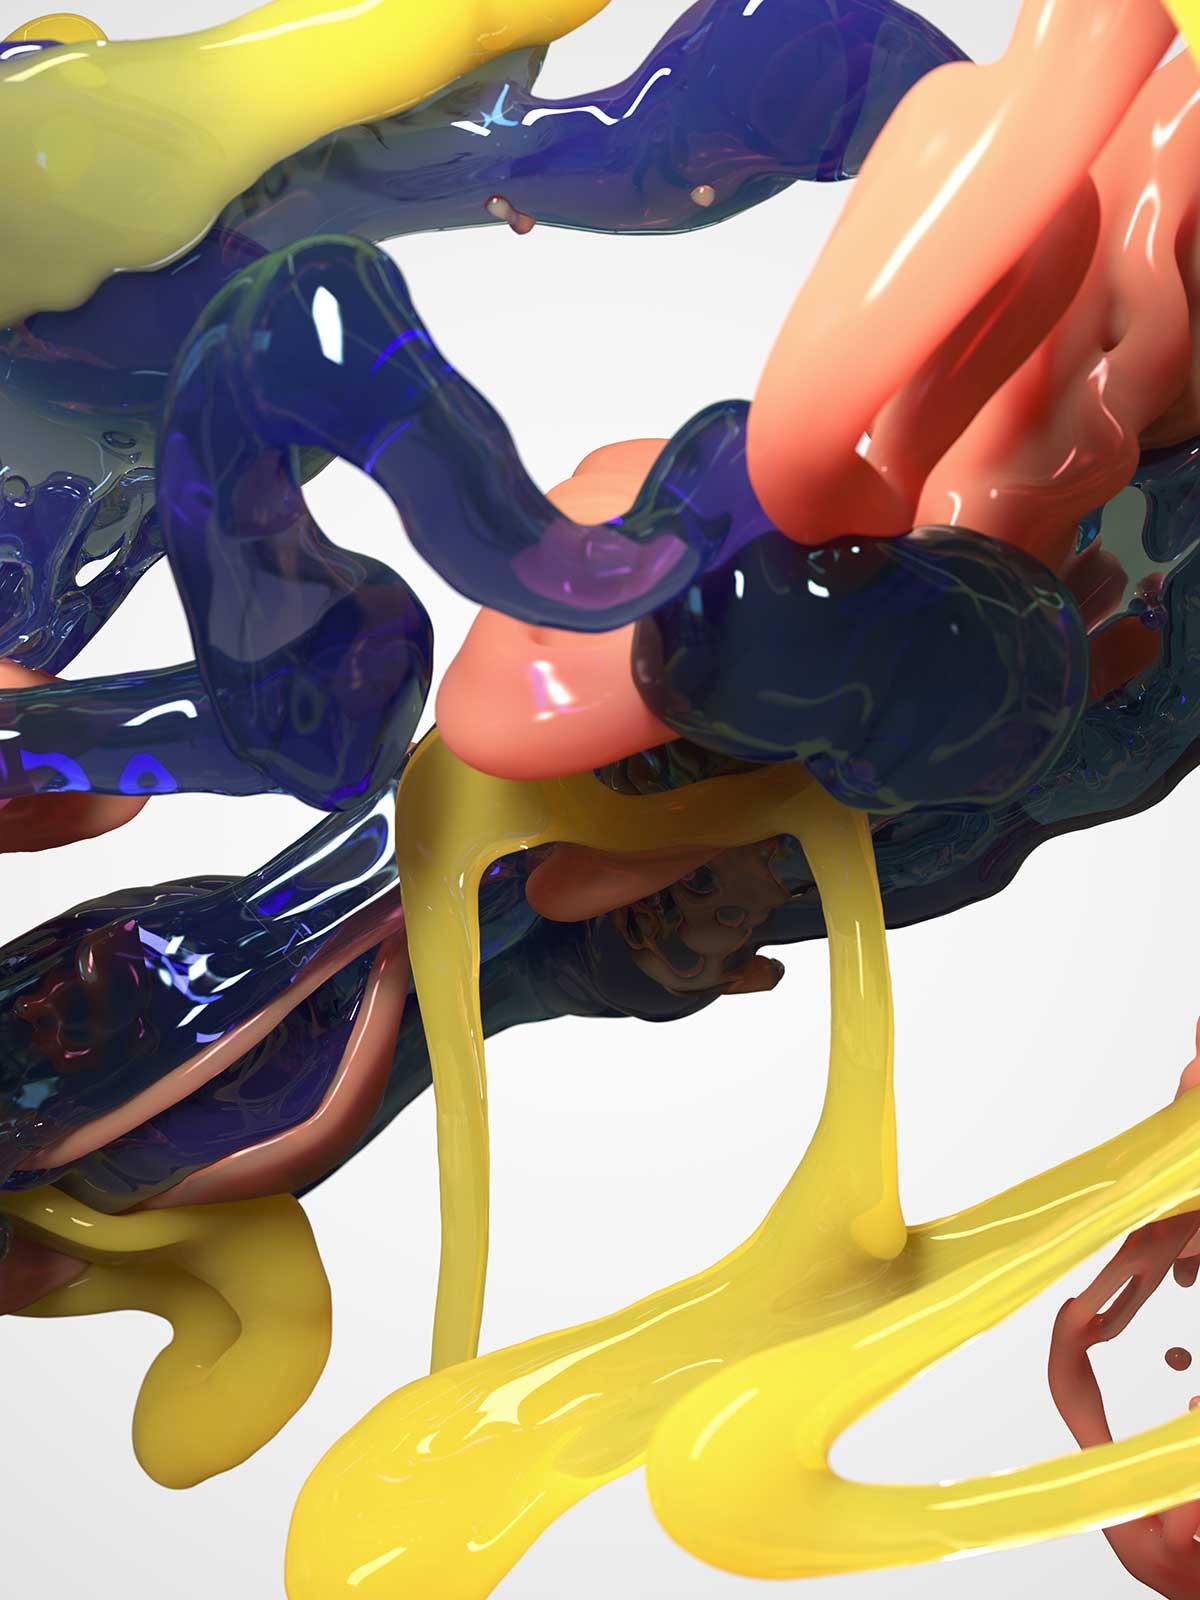 Bodypaint III 04, CGI Fine Art Print, 140 x 105 cm, 2016